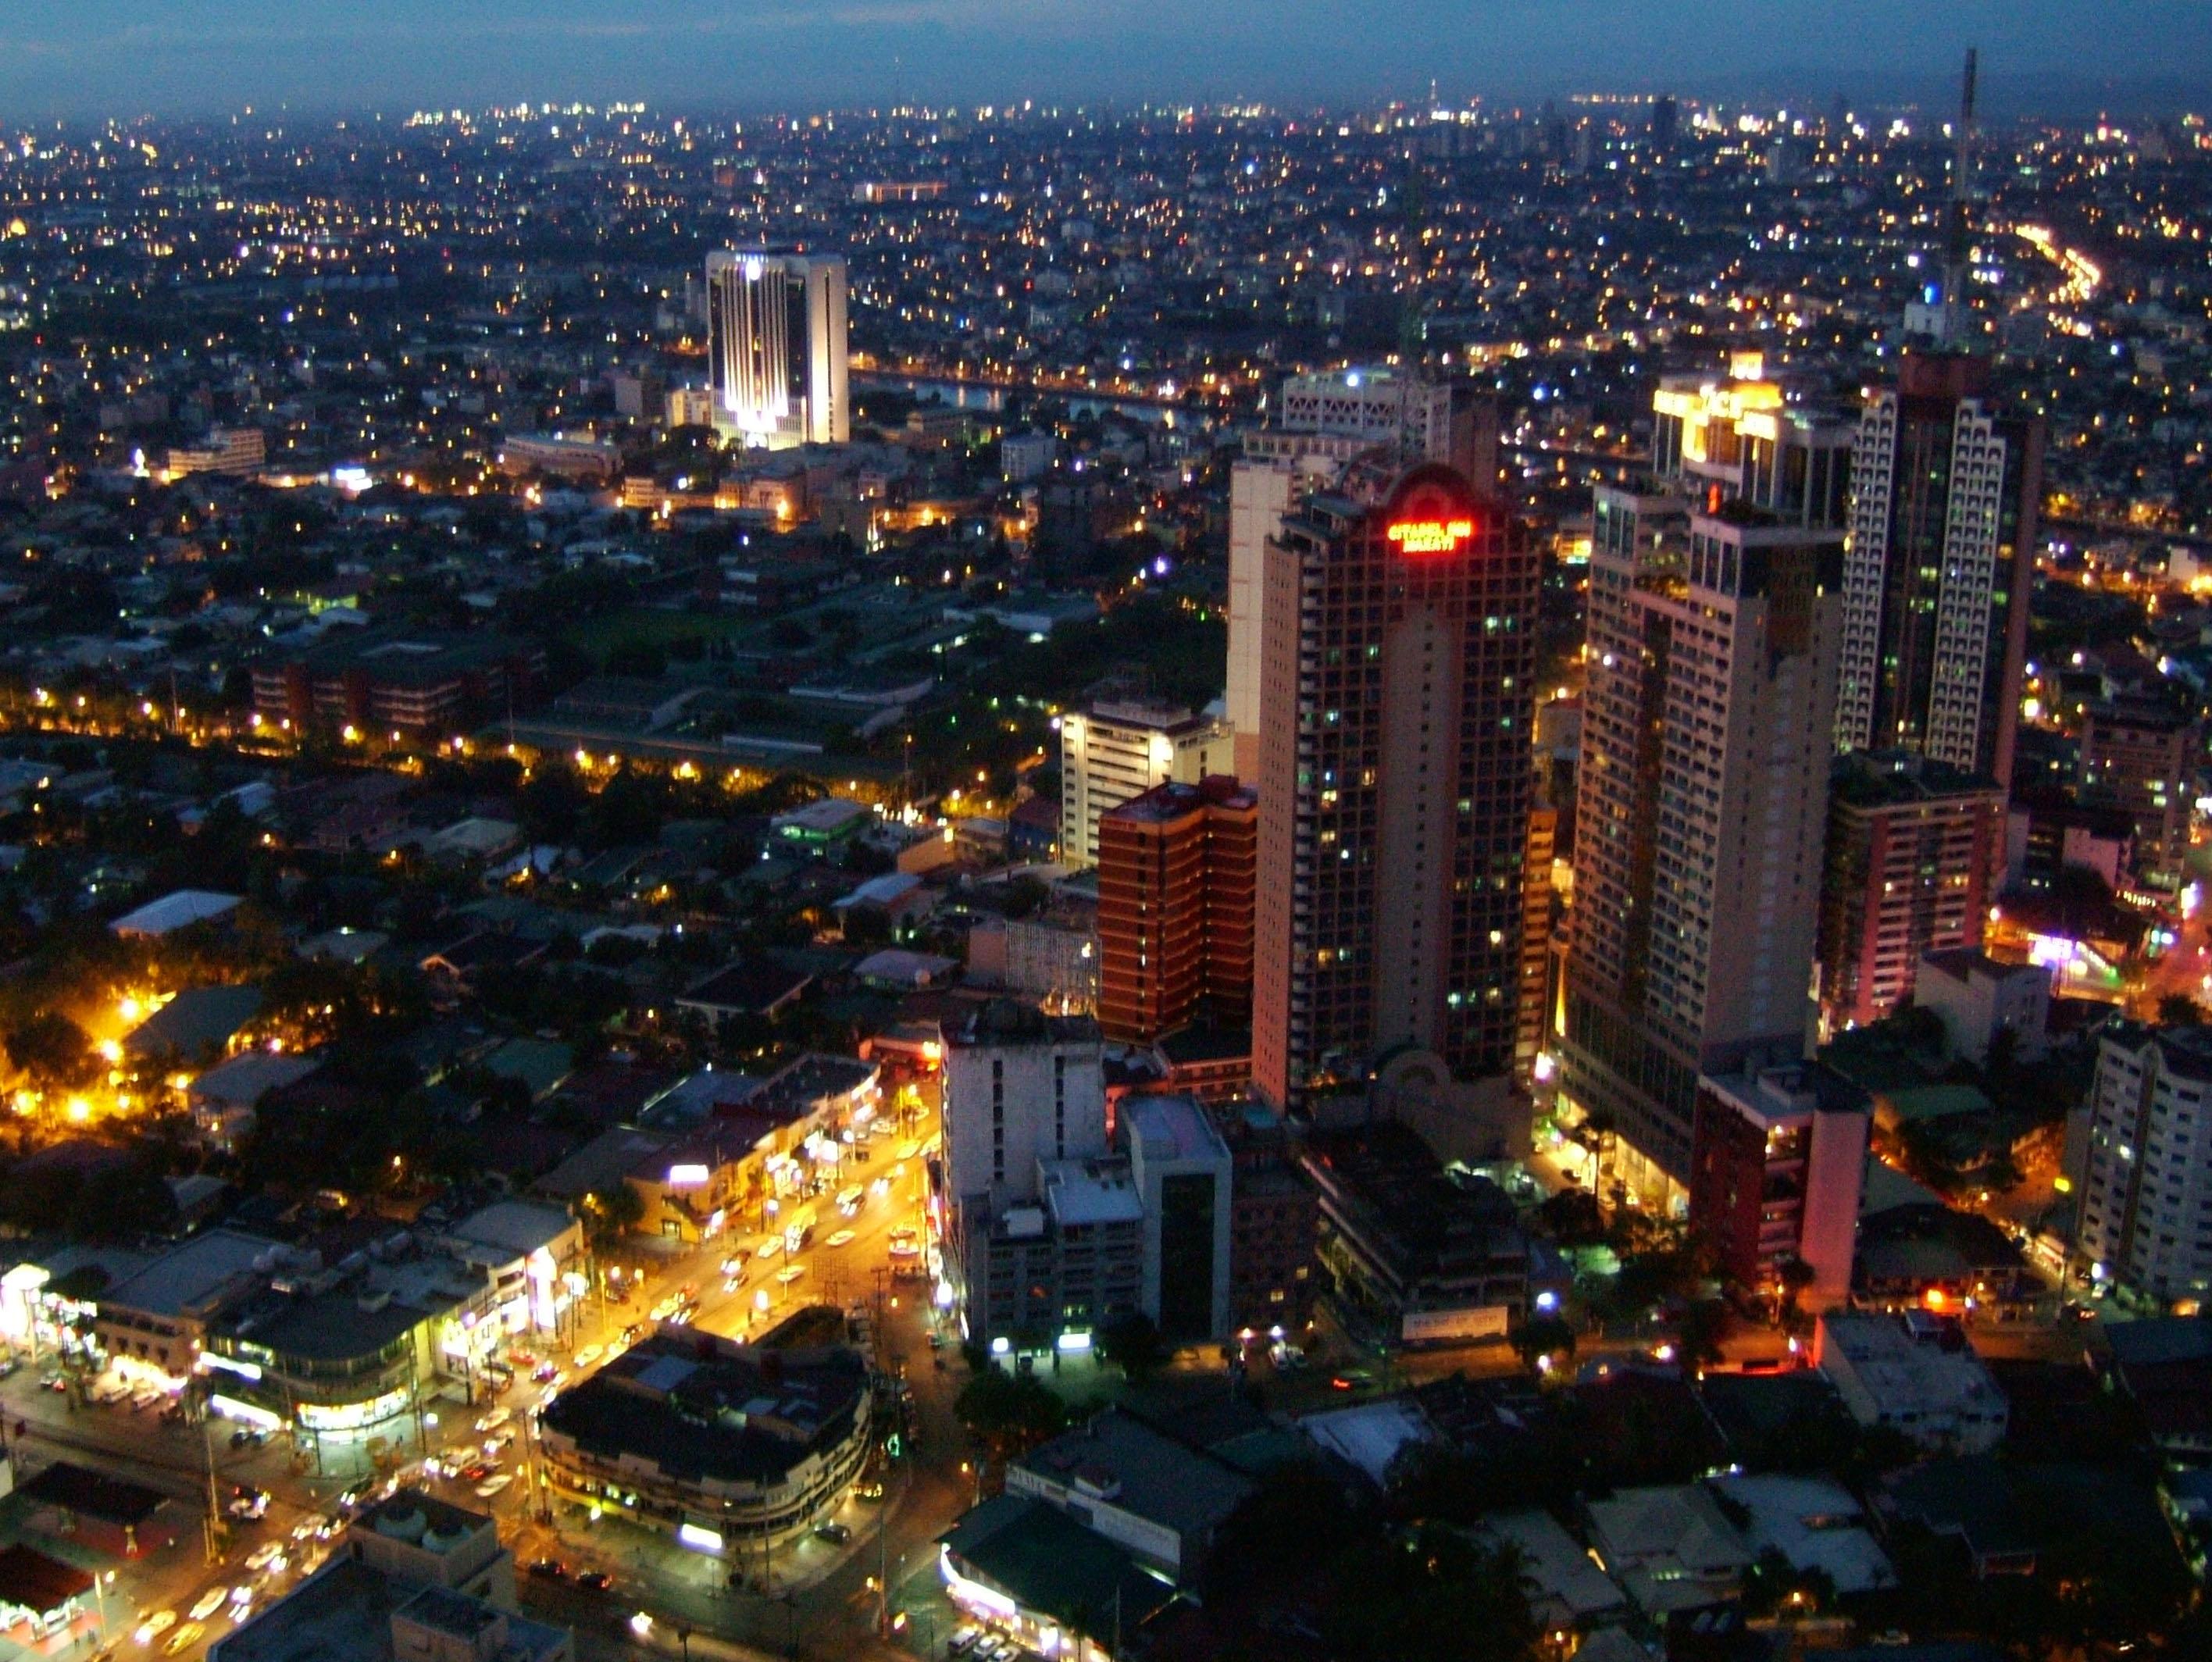 Sunset Philippines Manila Makati Roxas triangle 01